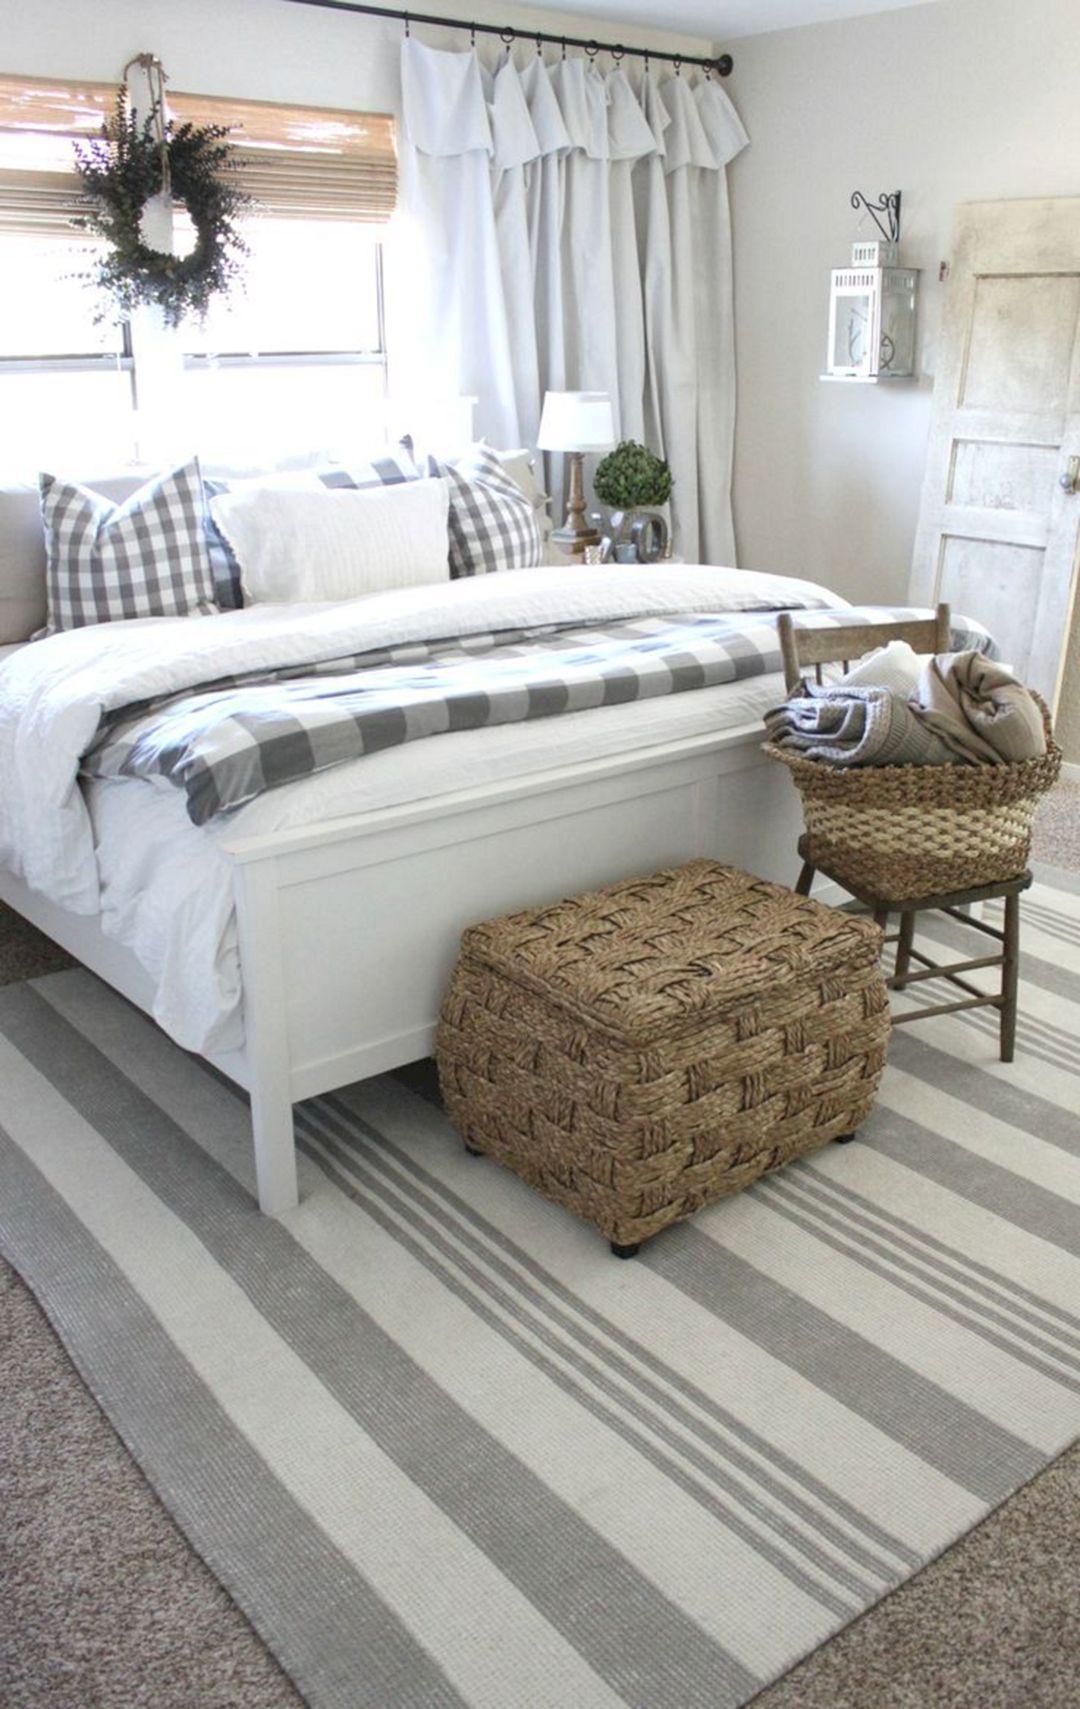 Modern contemporary master bedroom decor   Incredible Guest Bedroom Design Ideas   Bedroom Design